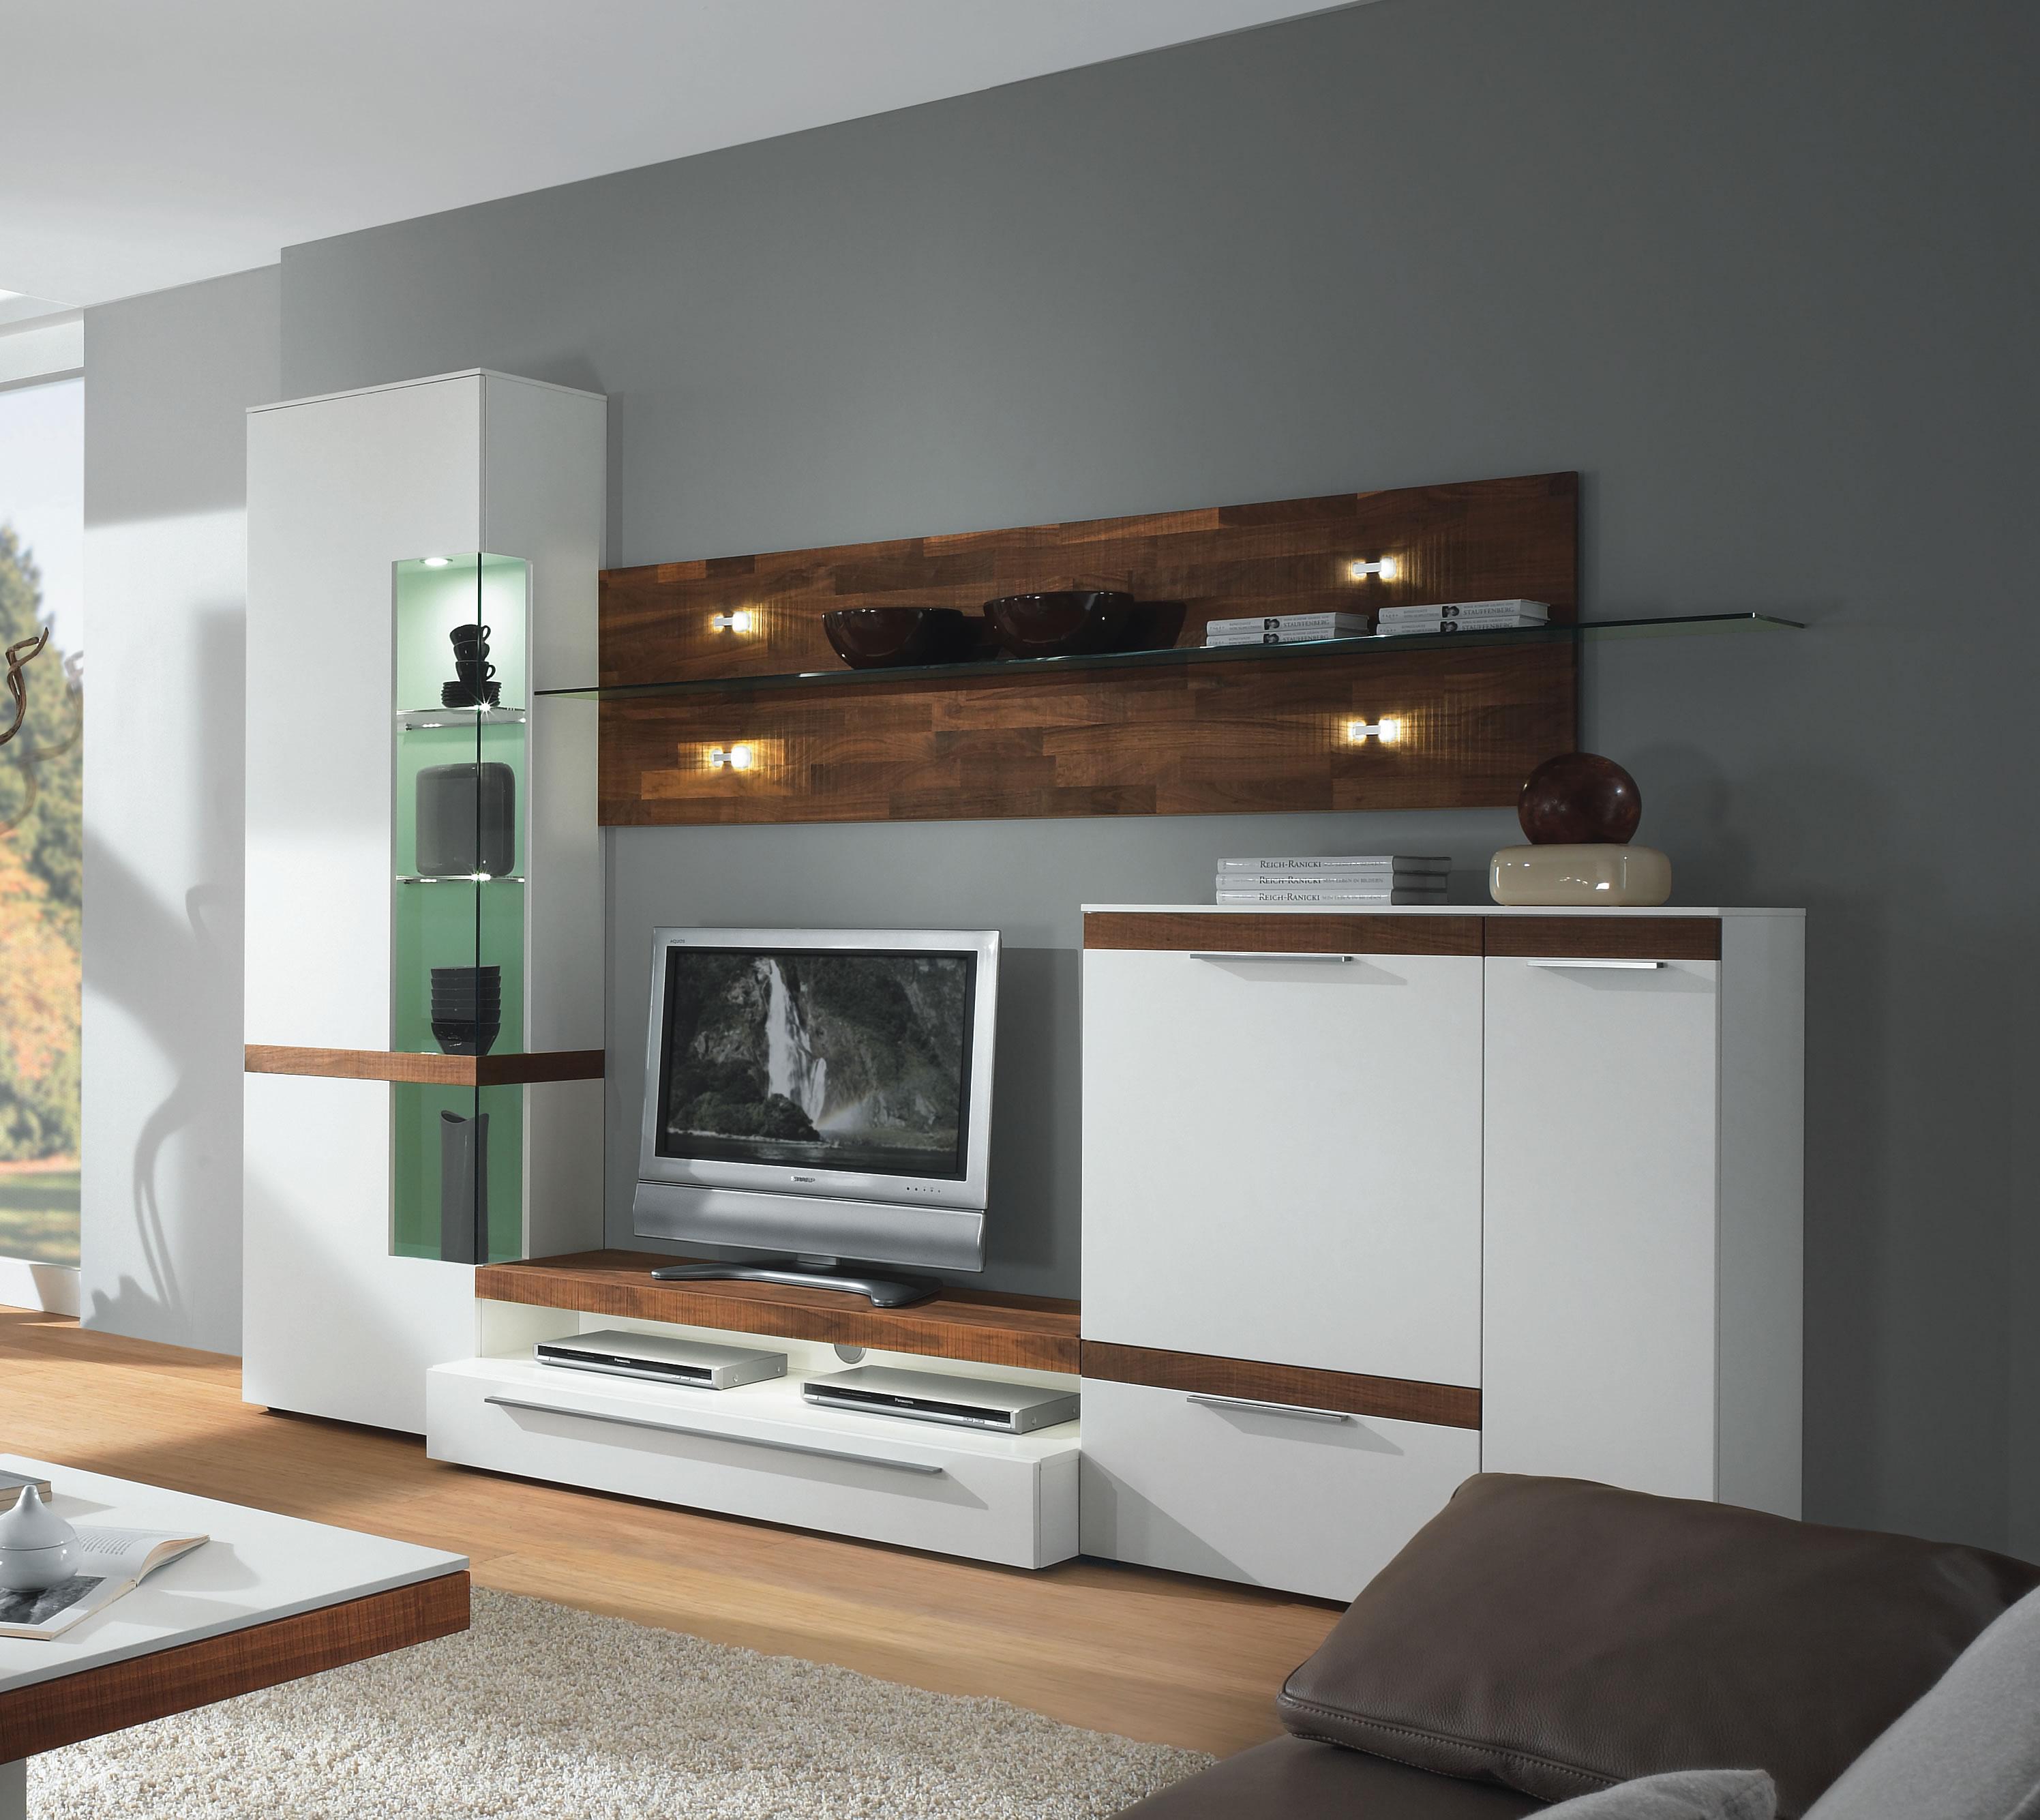 kubo m bel online interessante ideen f r. Black Bedroom Furniture Sets. Home Design Ideas